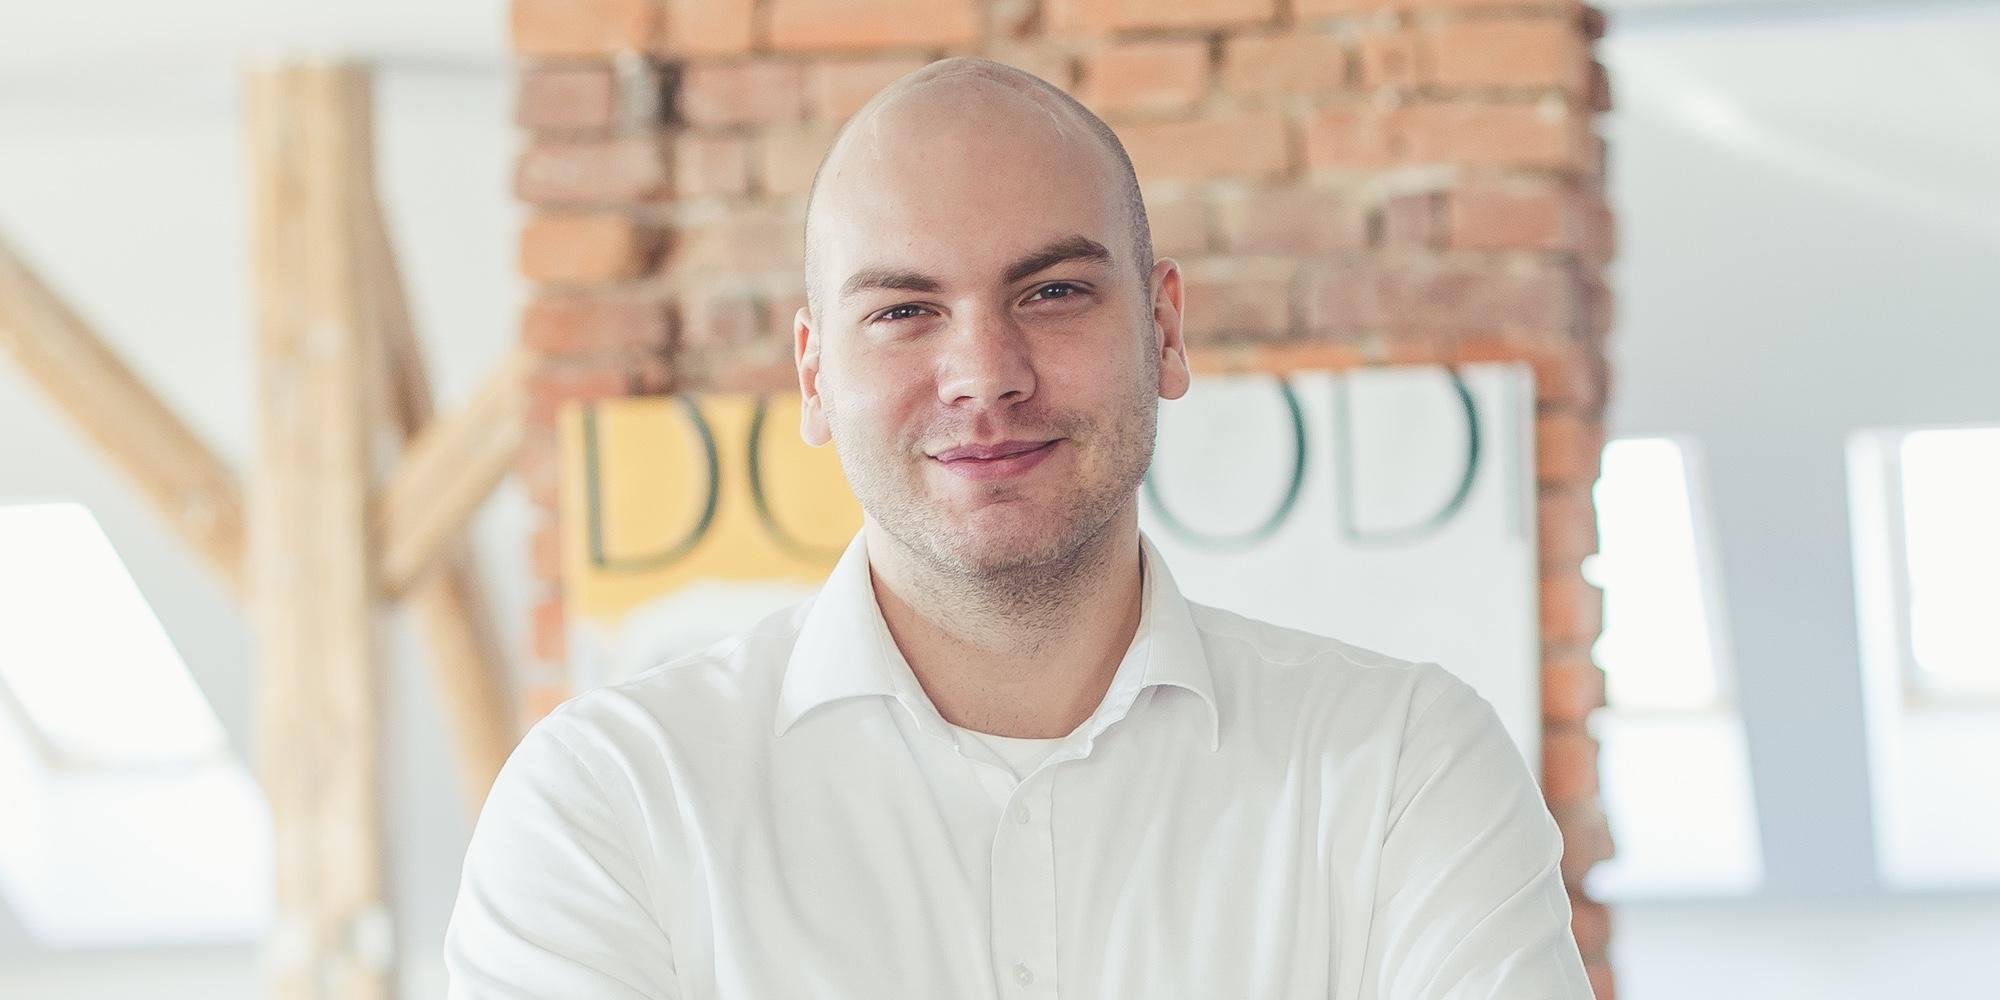 Jan Klusoň, CEO Proudly